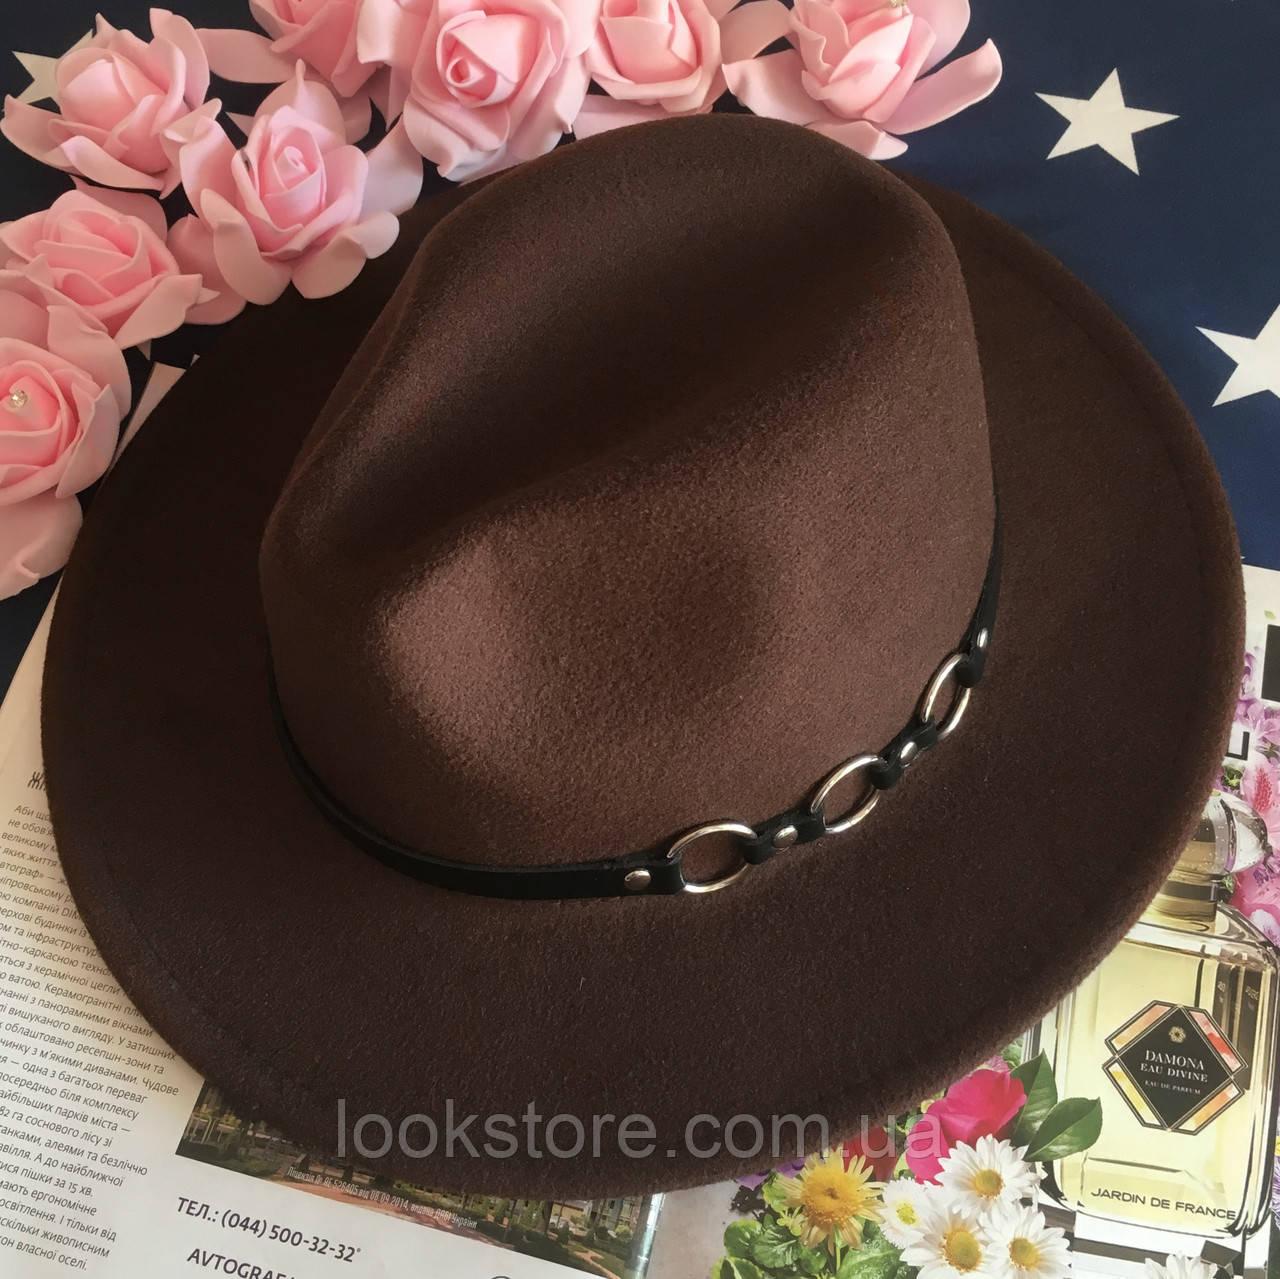 Шляпа Федора унисекс с устойчивыми полями Rings коричневая